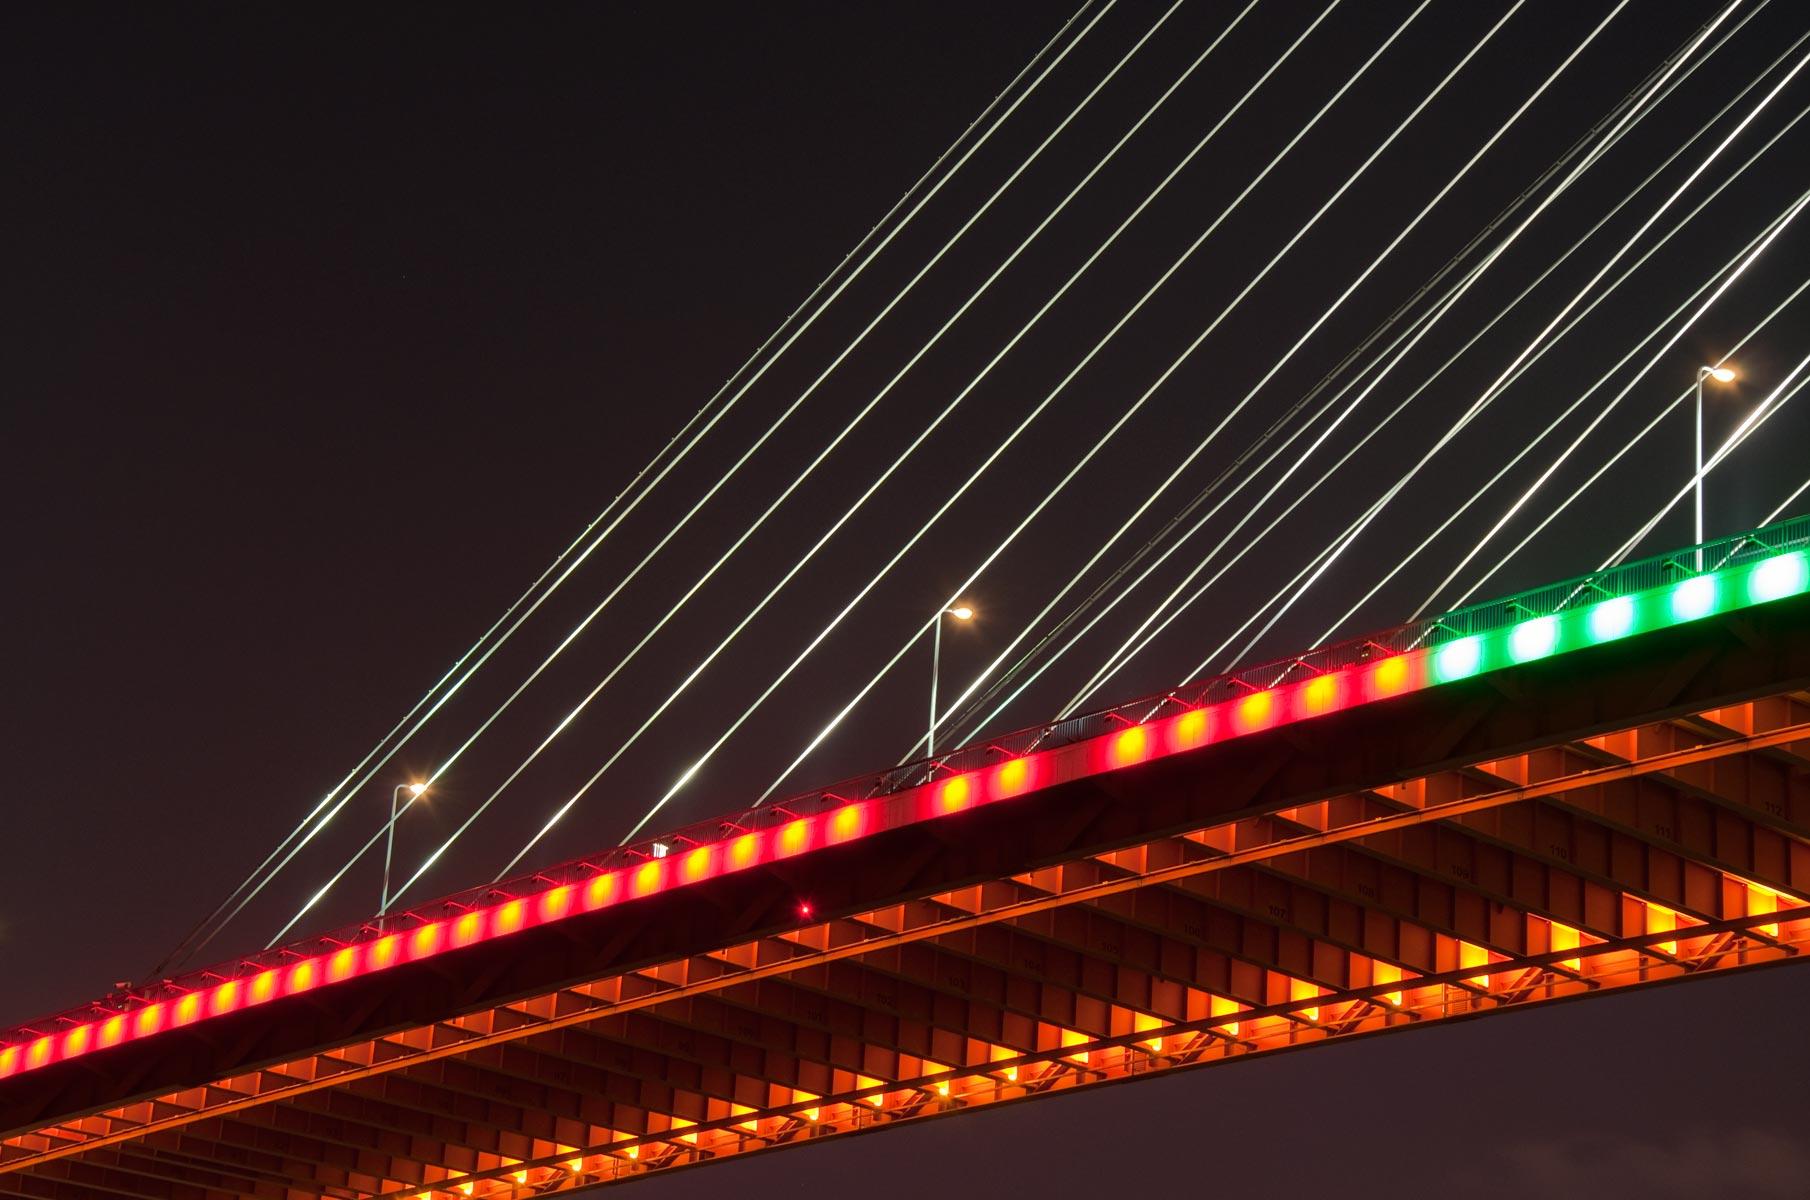 Beleuchtete Nanpu Brücke in Shanghai bei Nacht, China